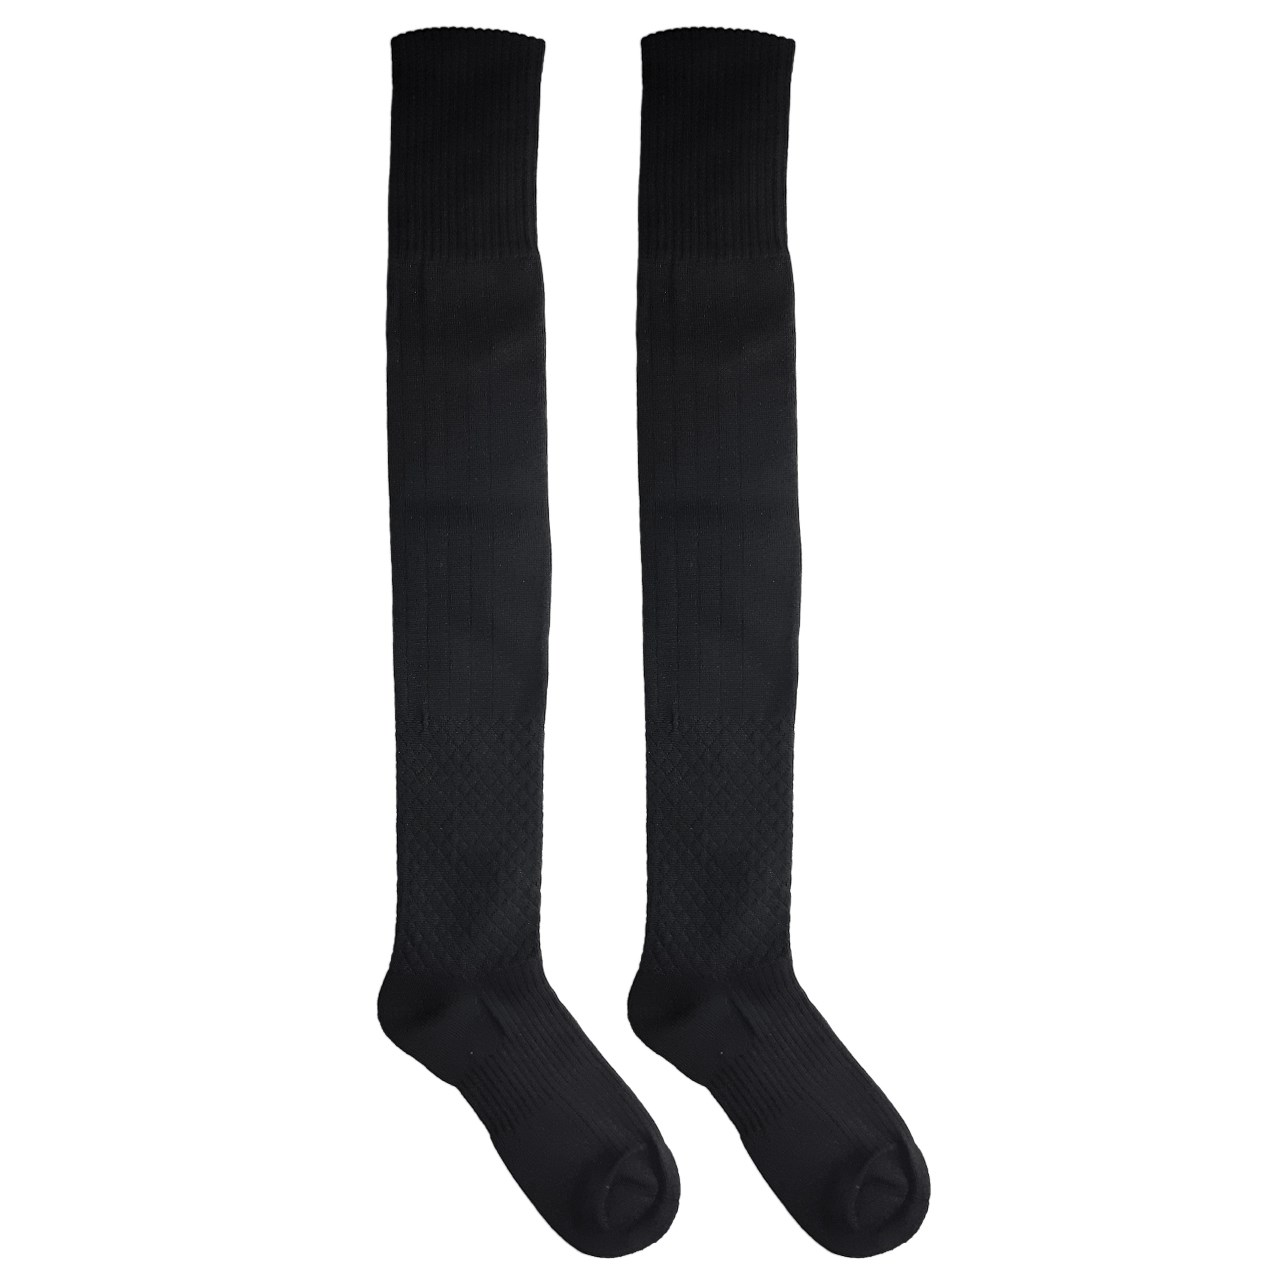 جوراب ورزشی مردانه اسپرت طرح لیگ برتری کد 02